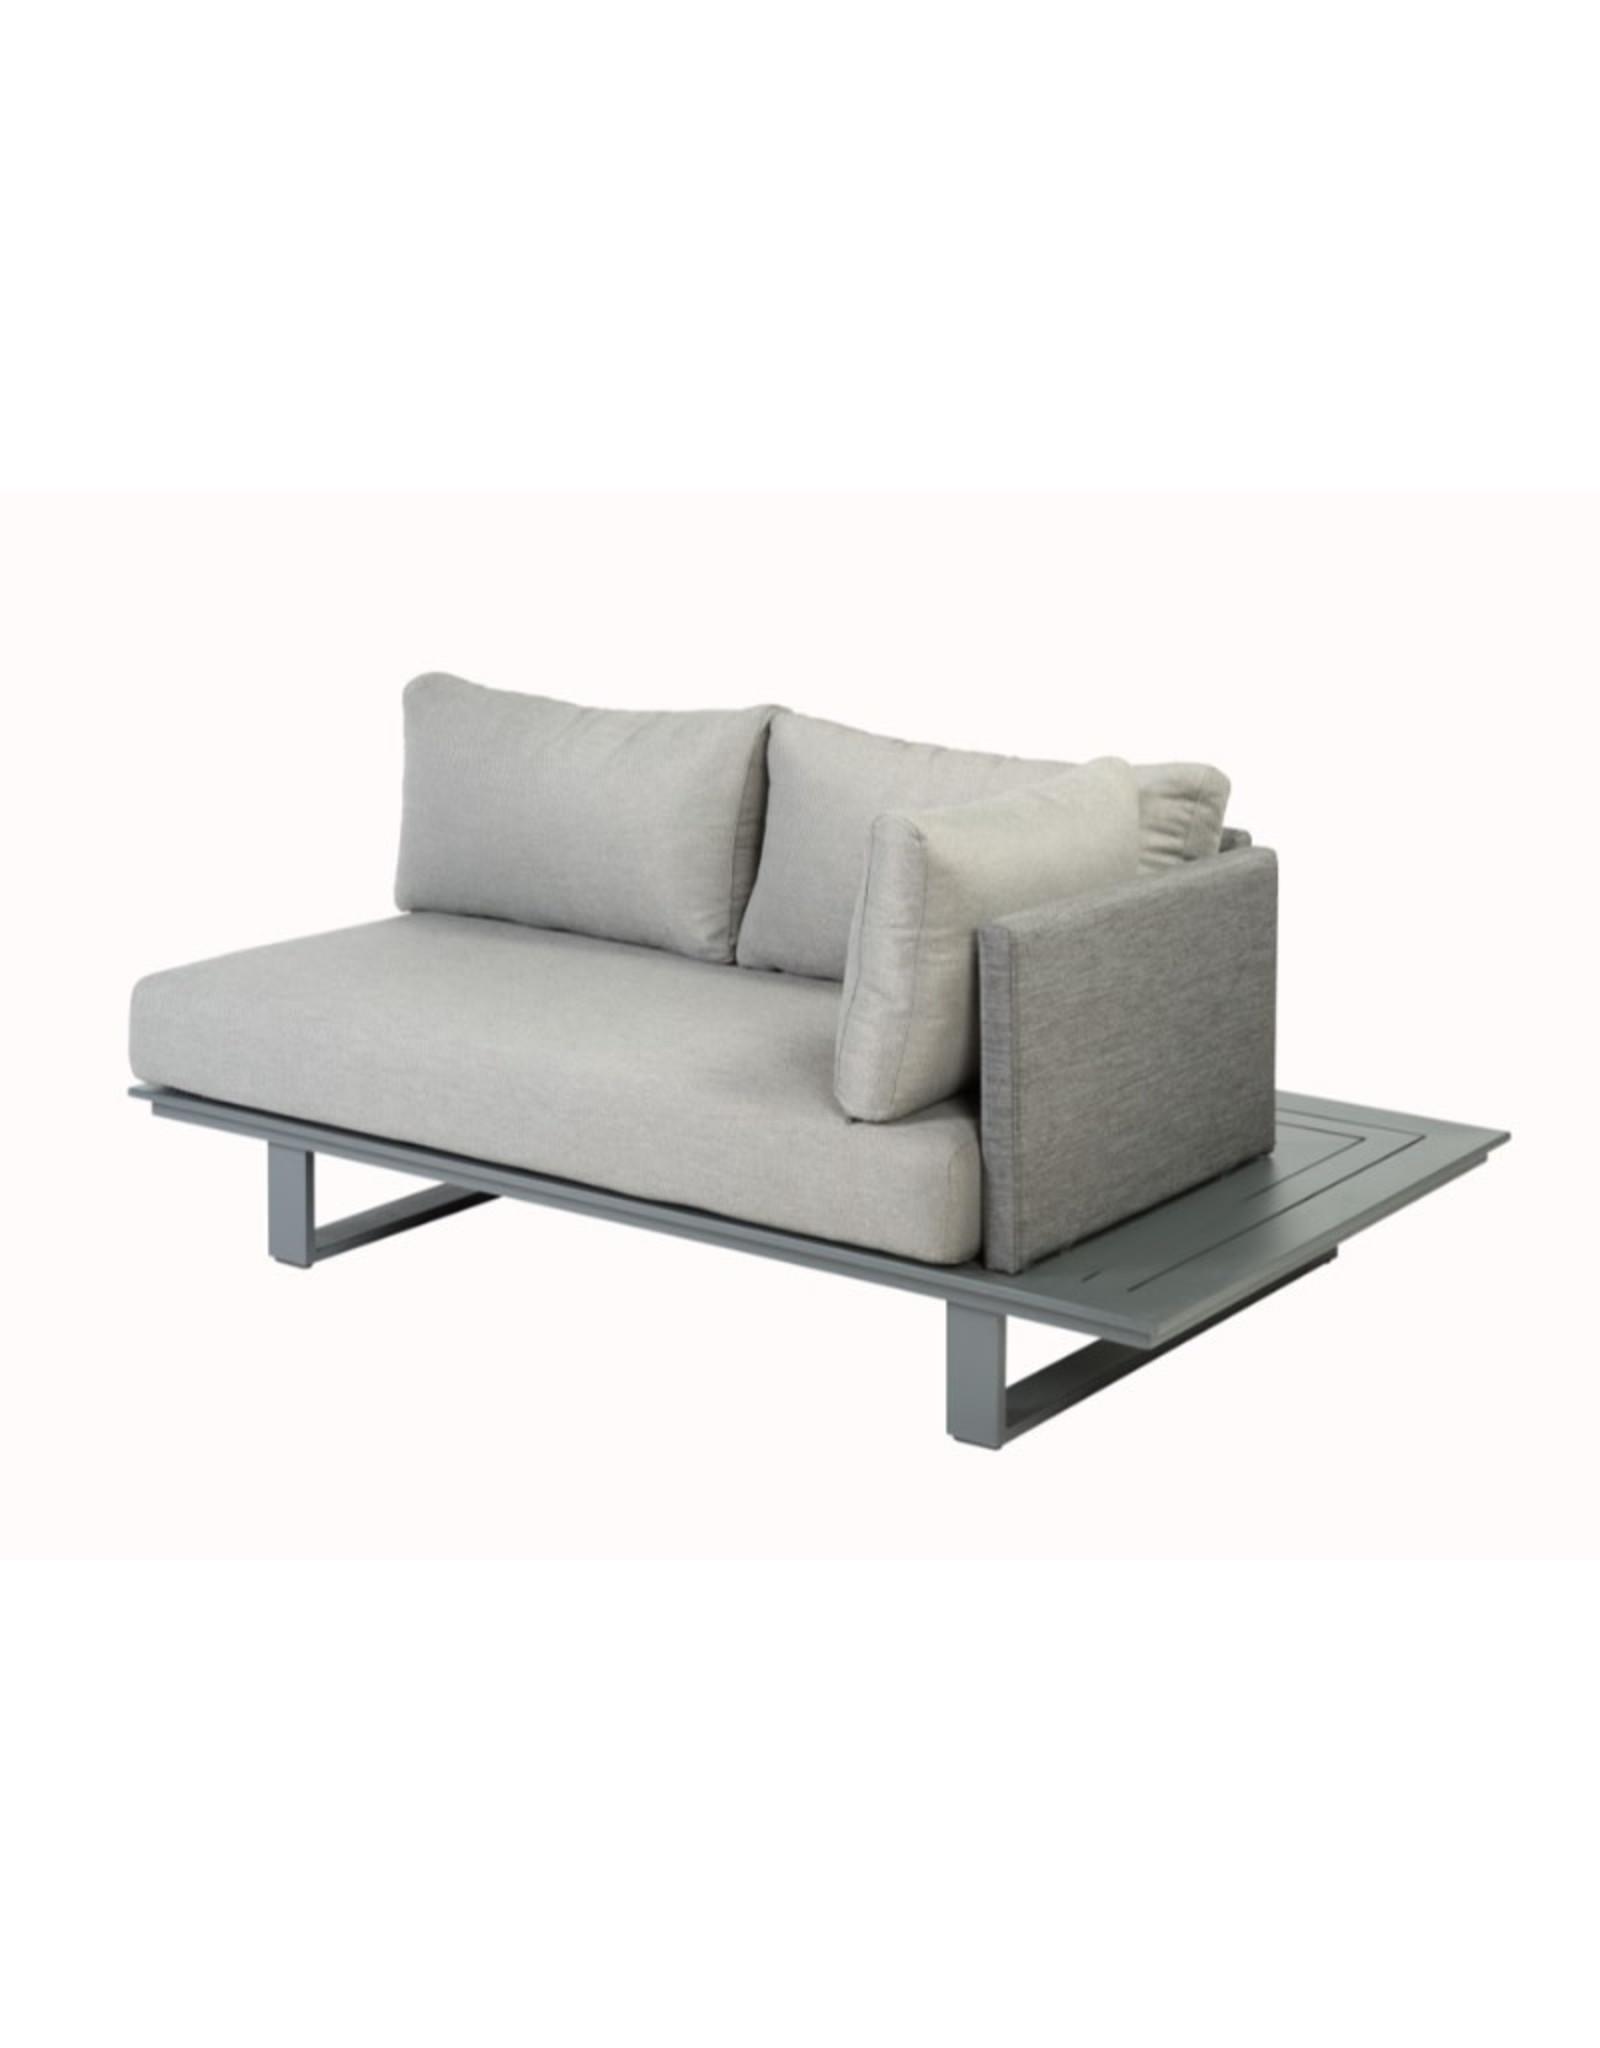 Tierra Outdoor Bora Bora platform lounge set full aluminium Left